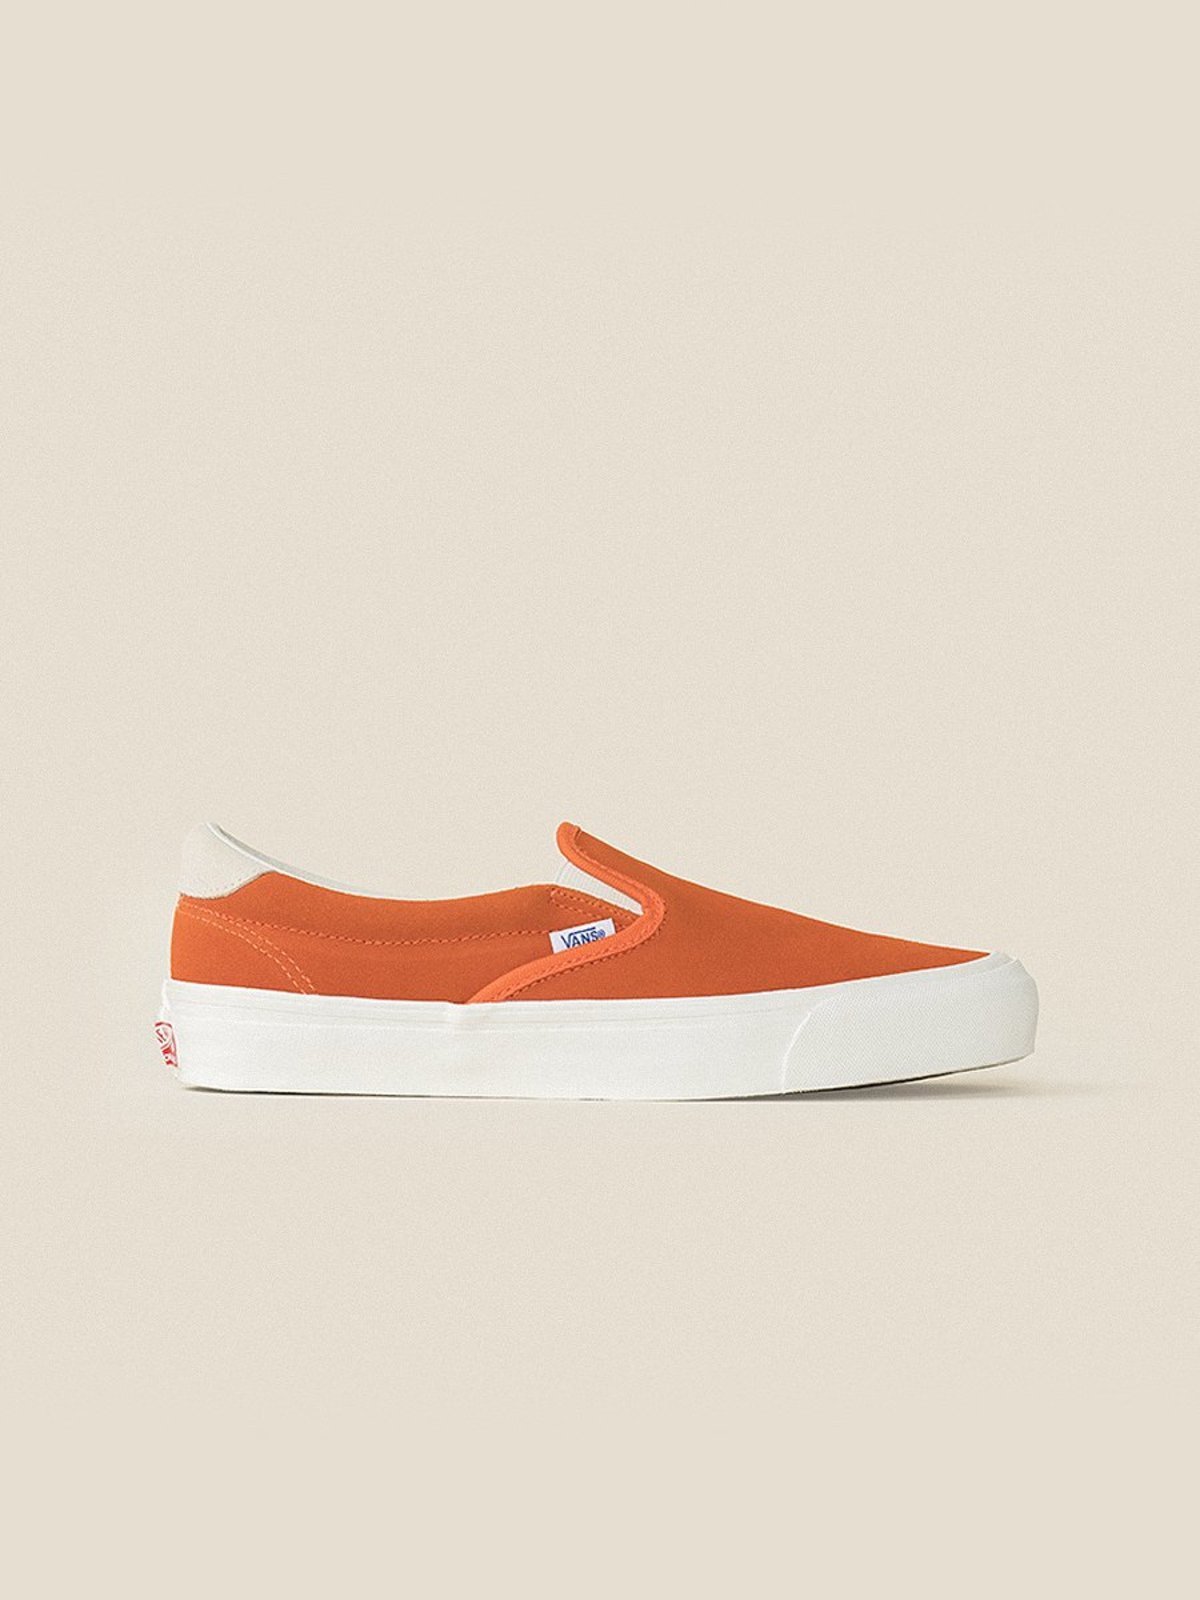 VANS VAULT OG Slip-On 59 LX (Suede) Red Orange Marshmallow  27ce0030e